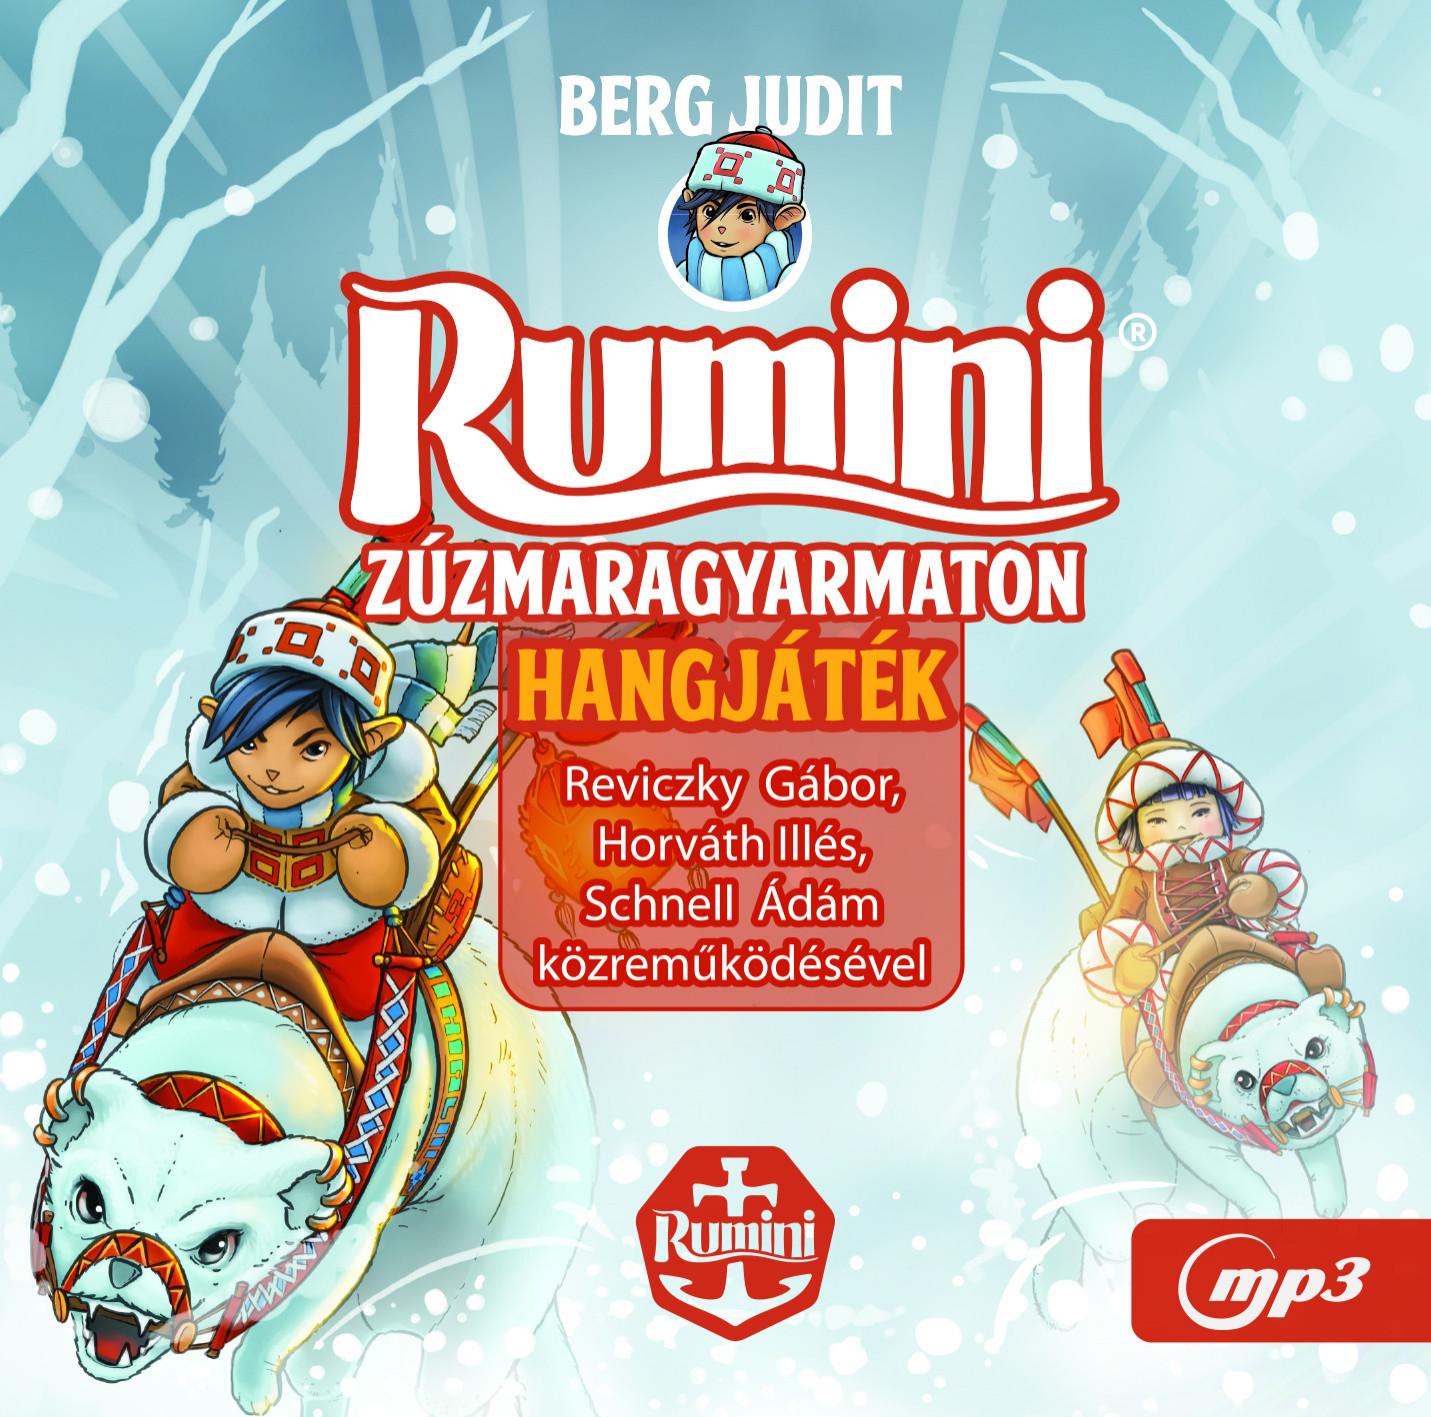 Rumini zúzmaragyarmaton - Hangoskönyv (Mp3) - Berg Judit pdf epub